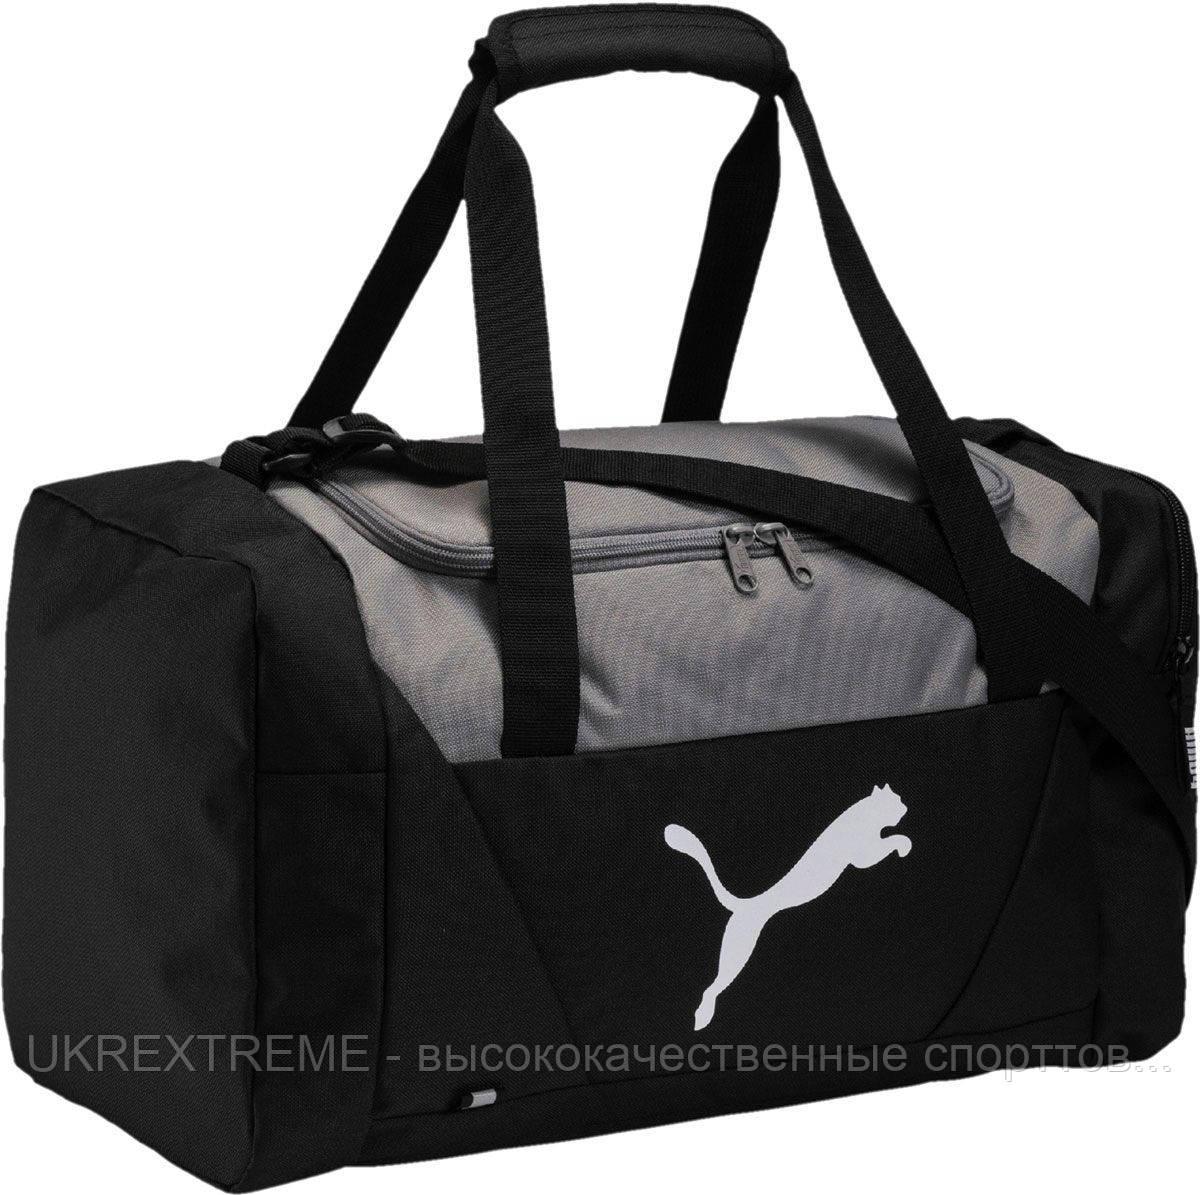 fdf56e7e218f Сумка Puma Fundamentals Sports Bag S (ОРИГИНАЛ) — в Категории ...